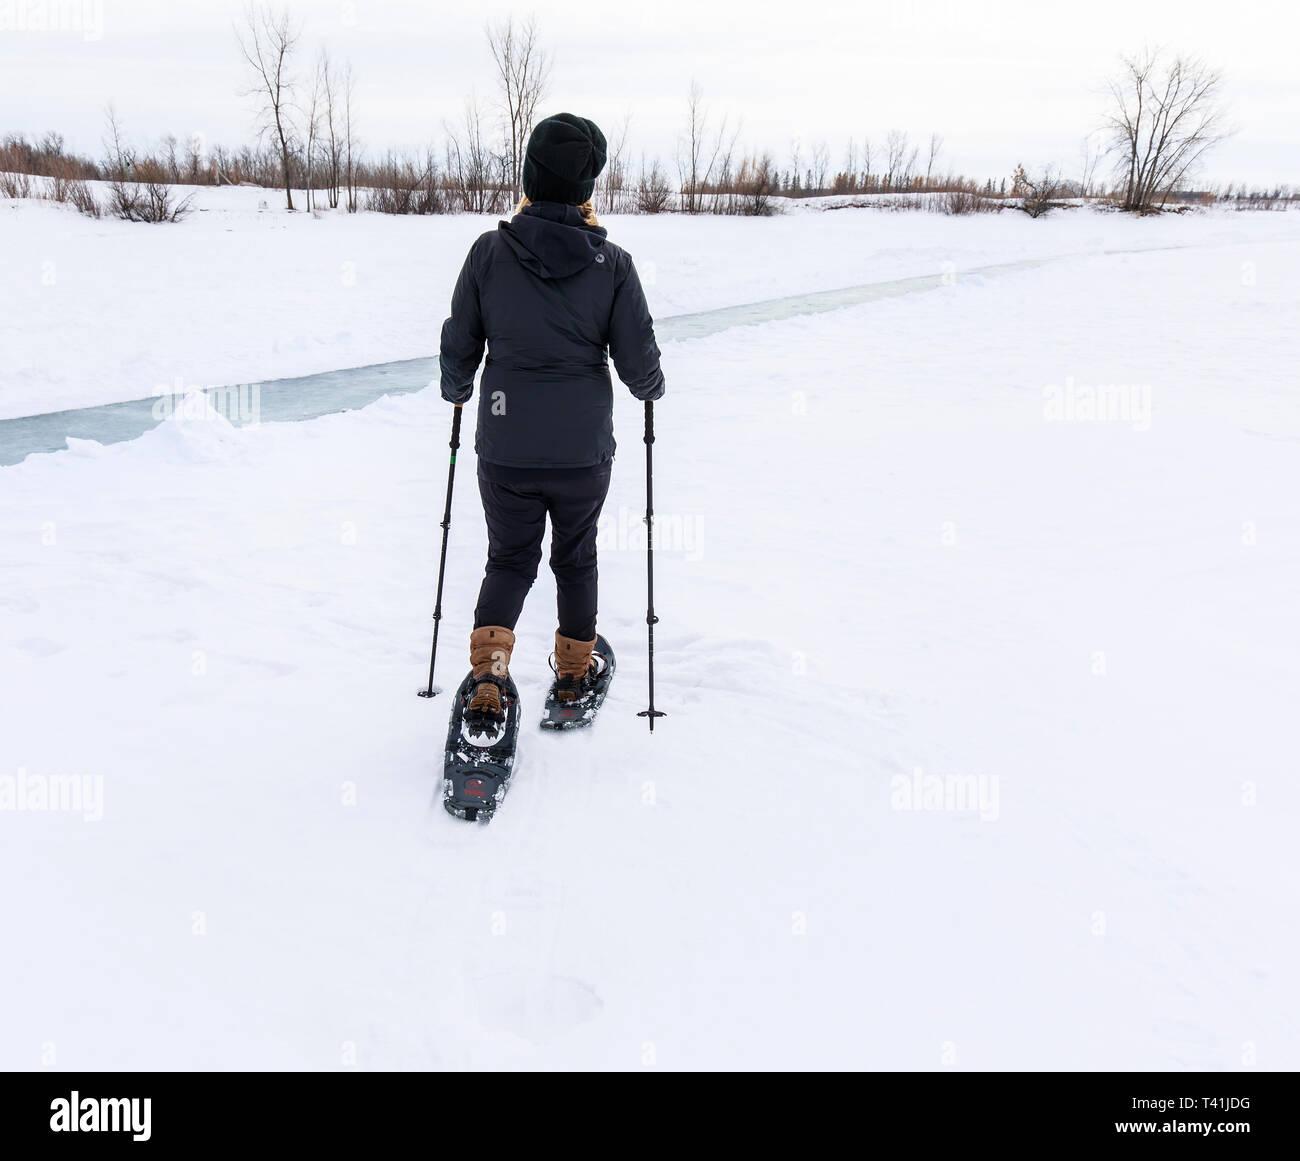 Femme en raquettes, au Manitoba, Canada. Photo Stock